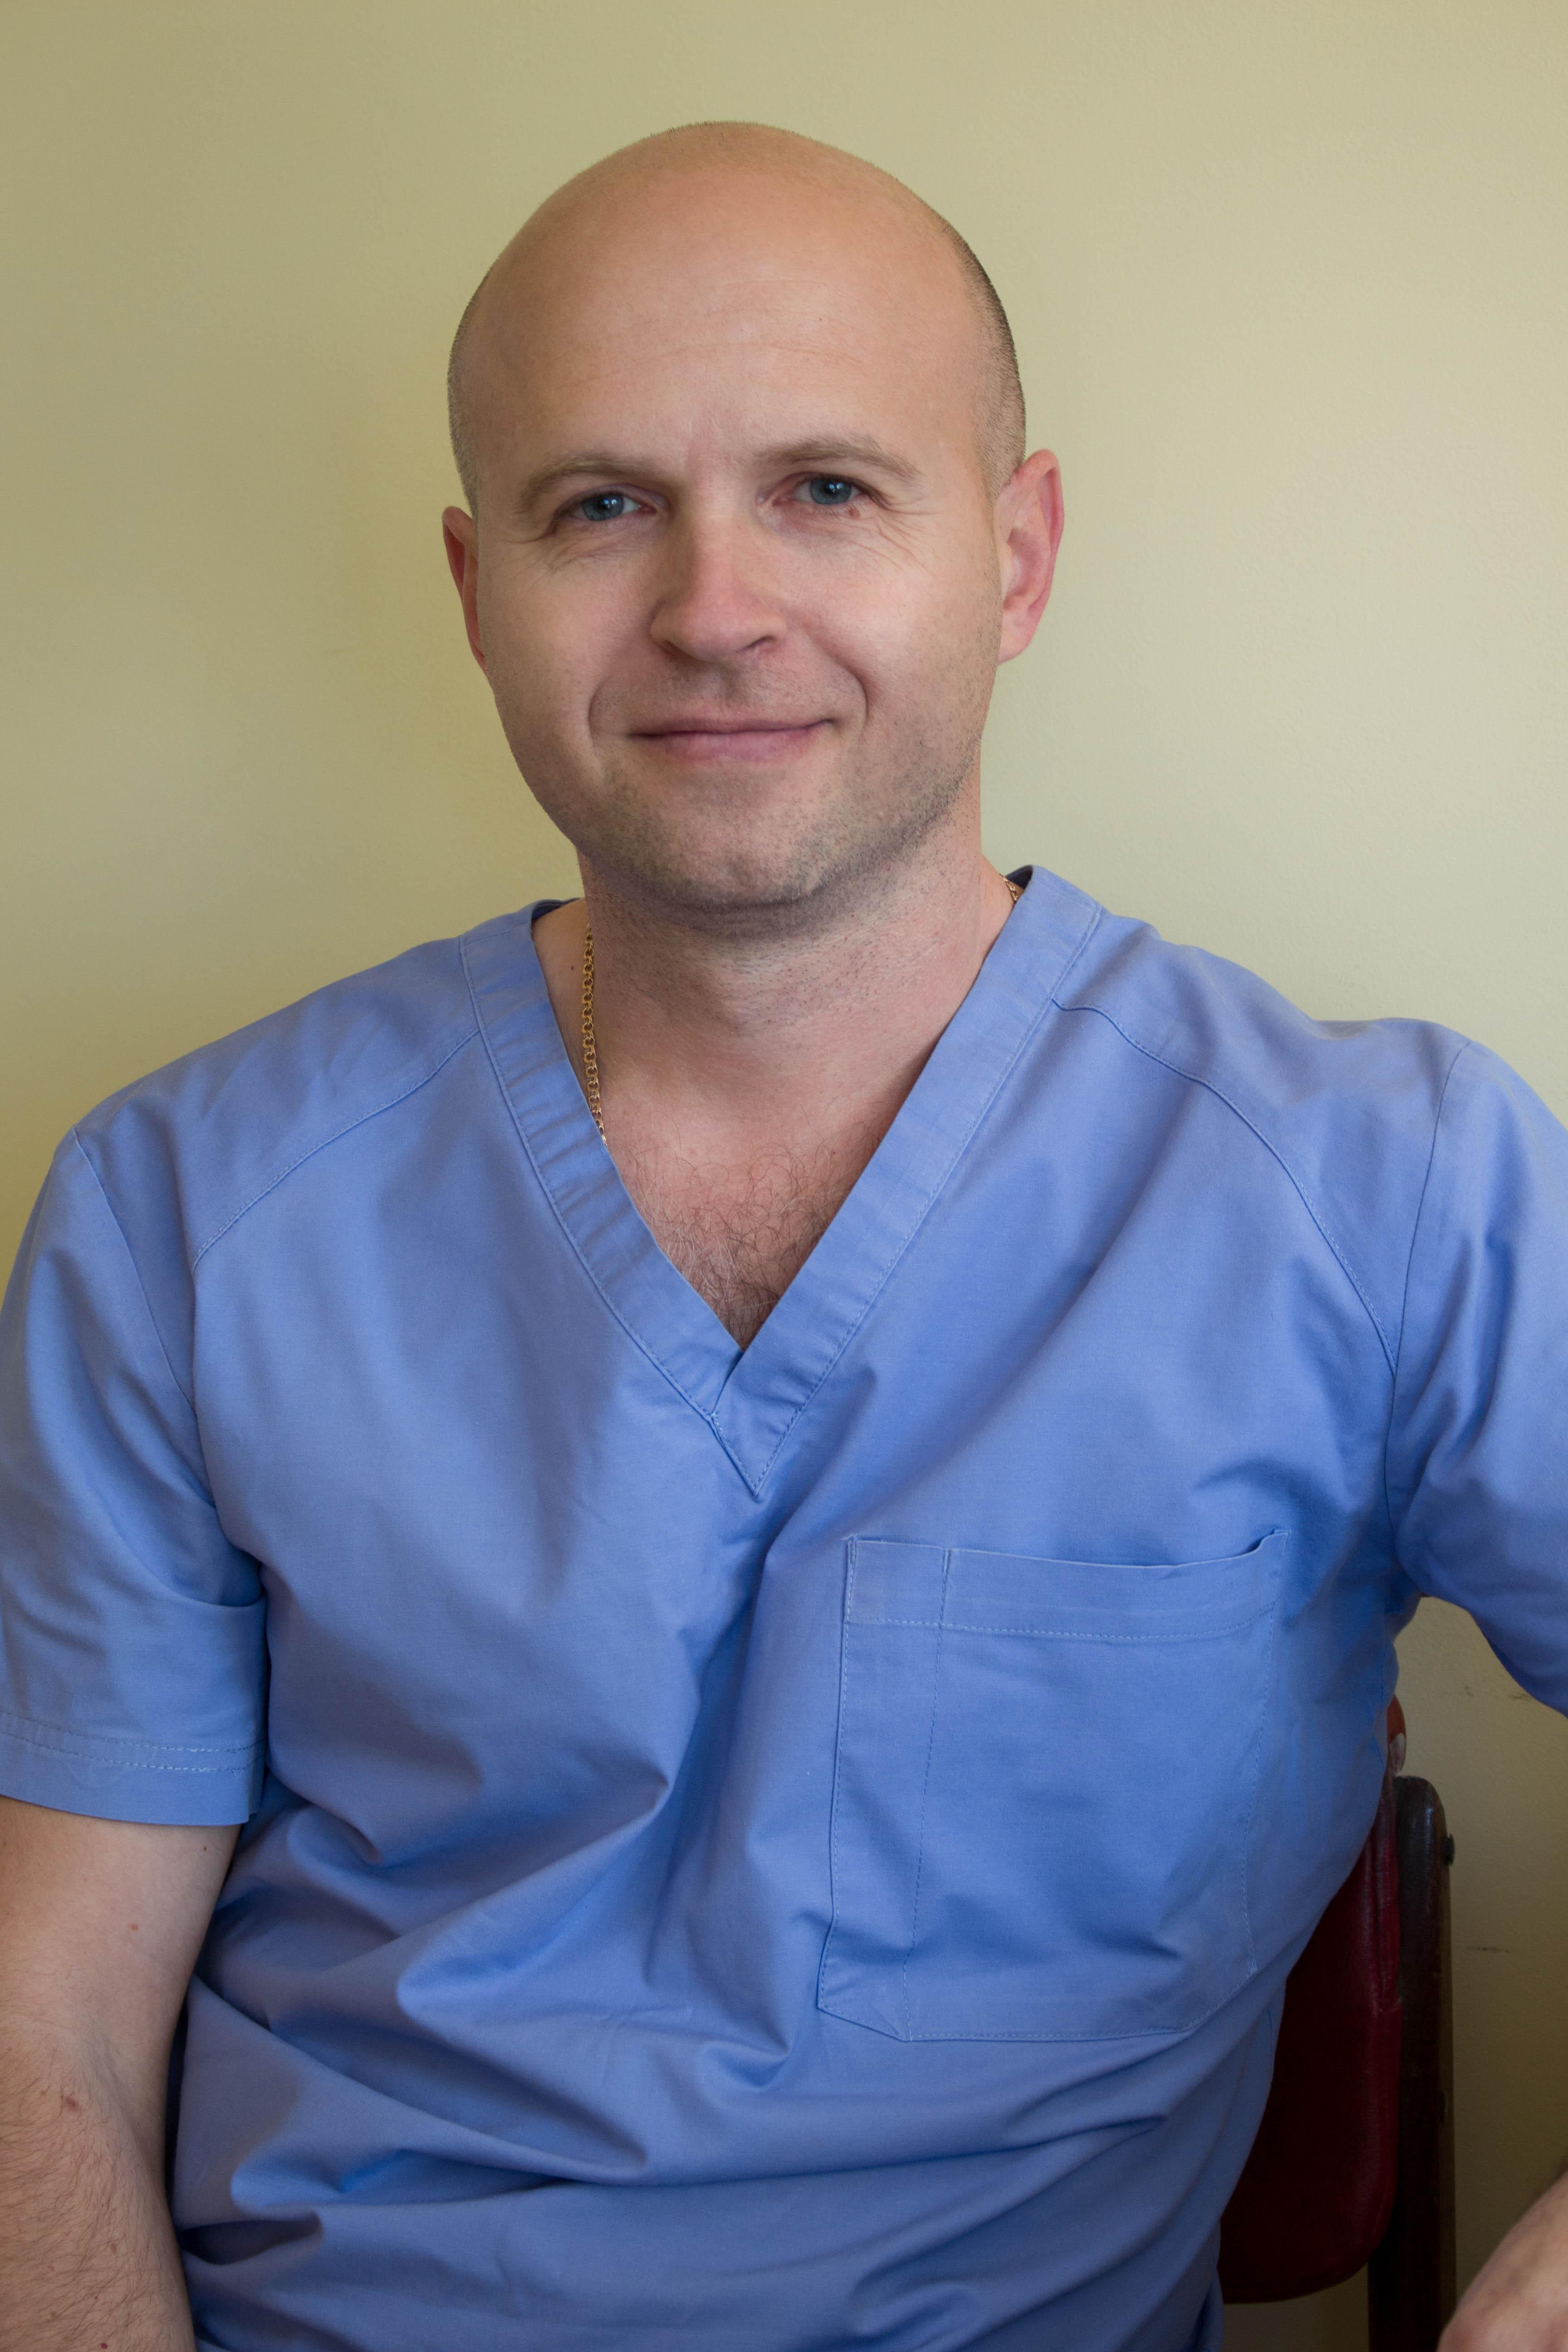 Кулик Андрей Александрович - врач хирург, флеболог.  Высшая категория. Стаж более 20 лет.